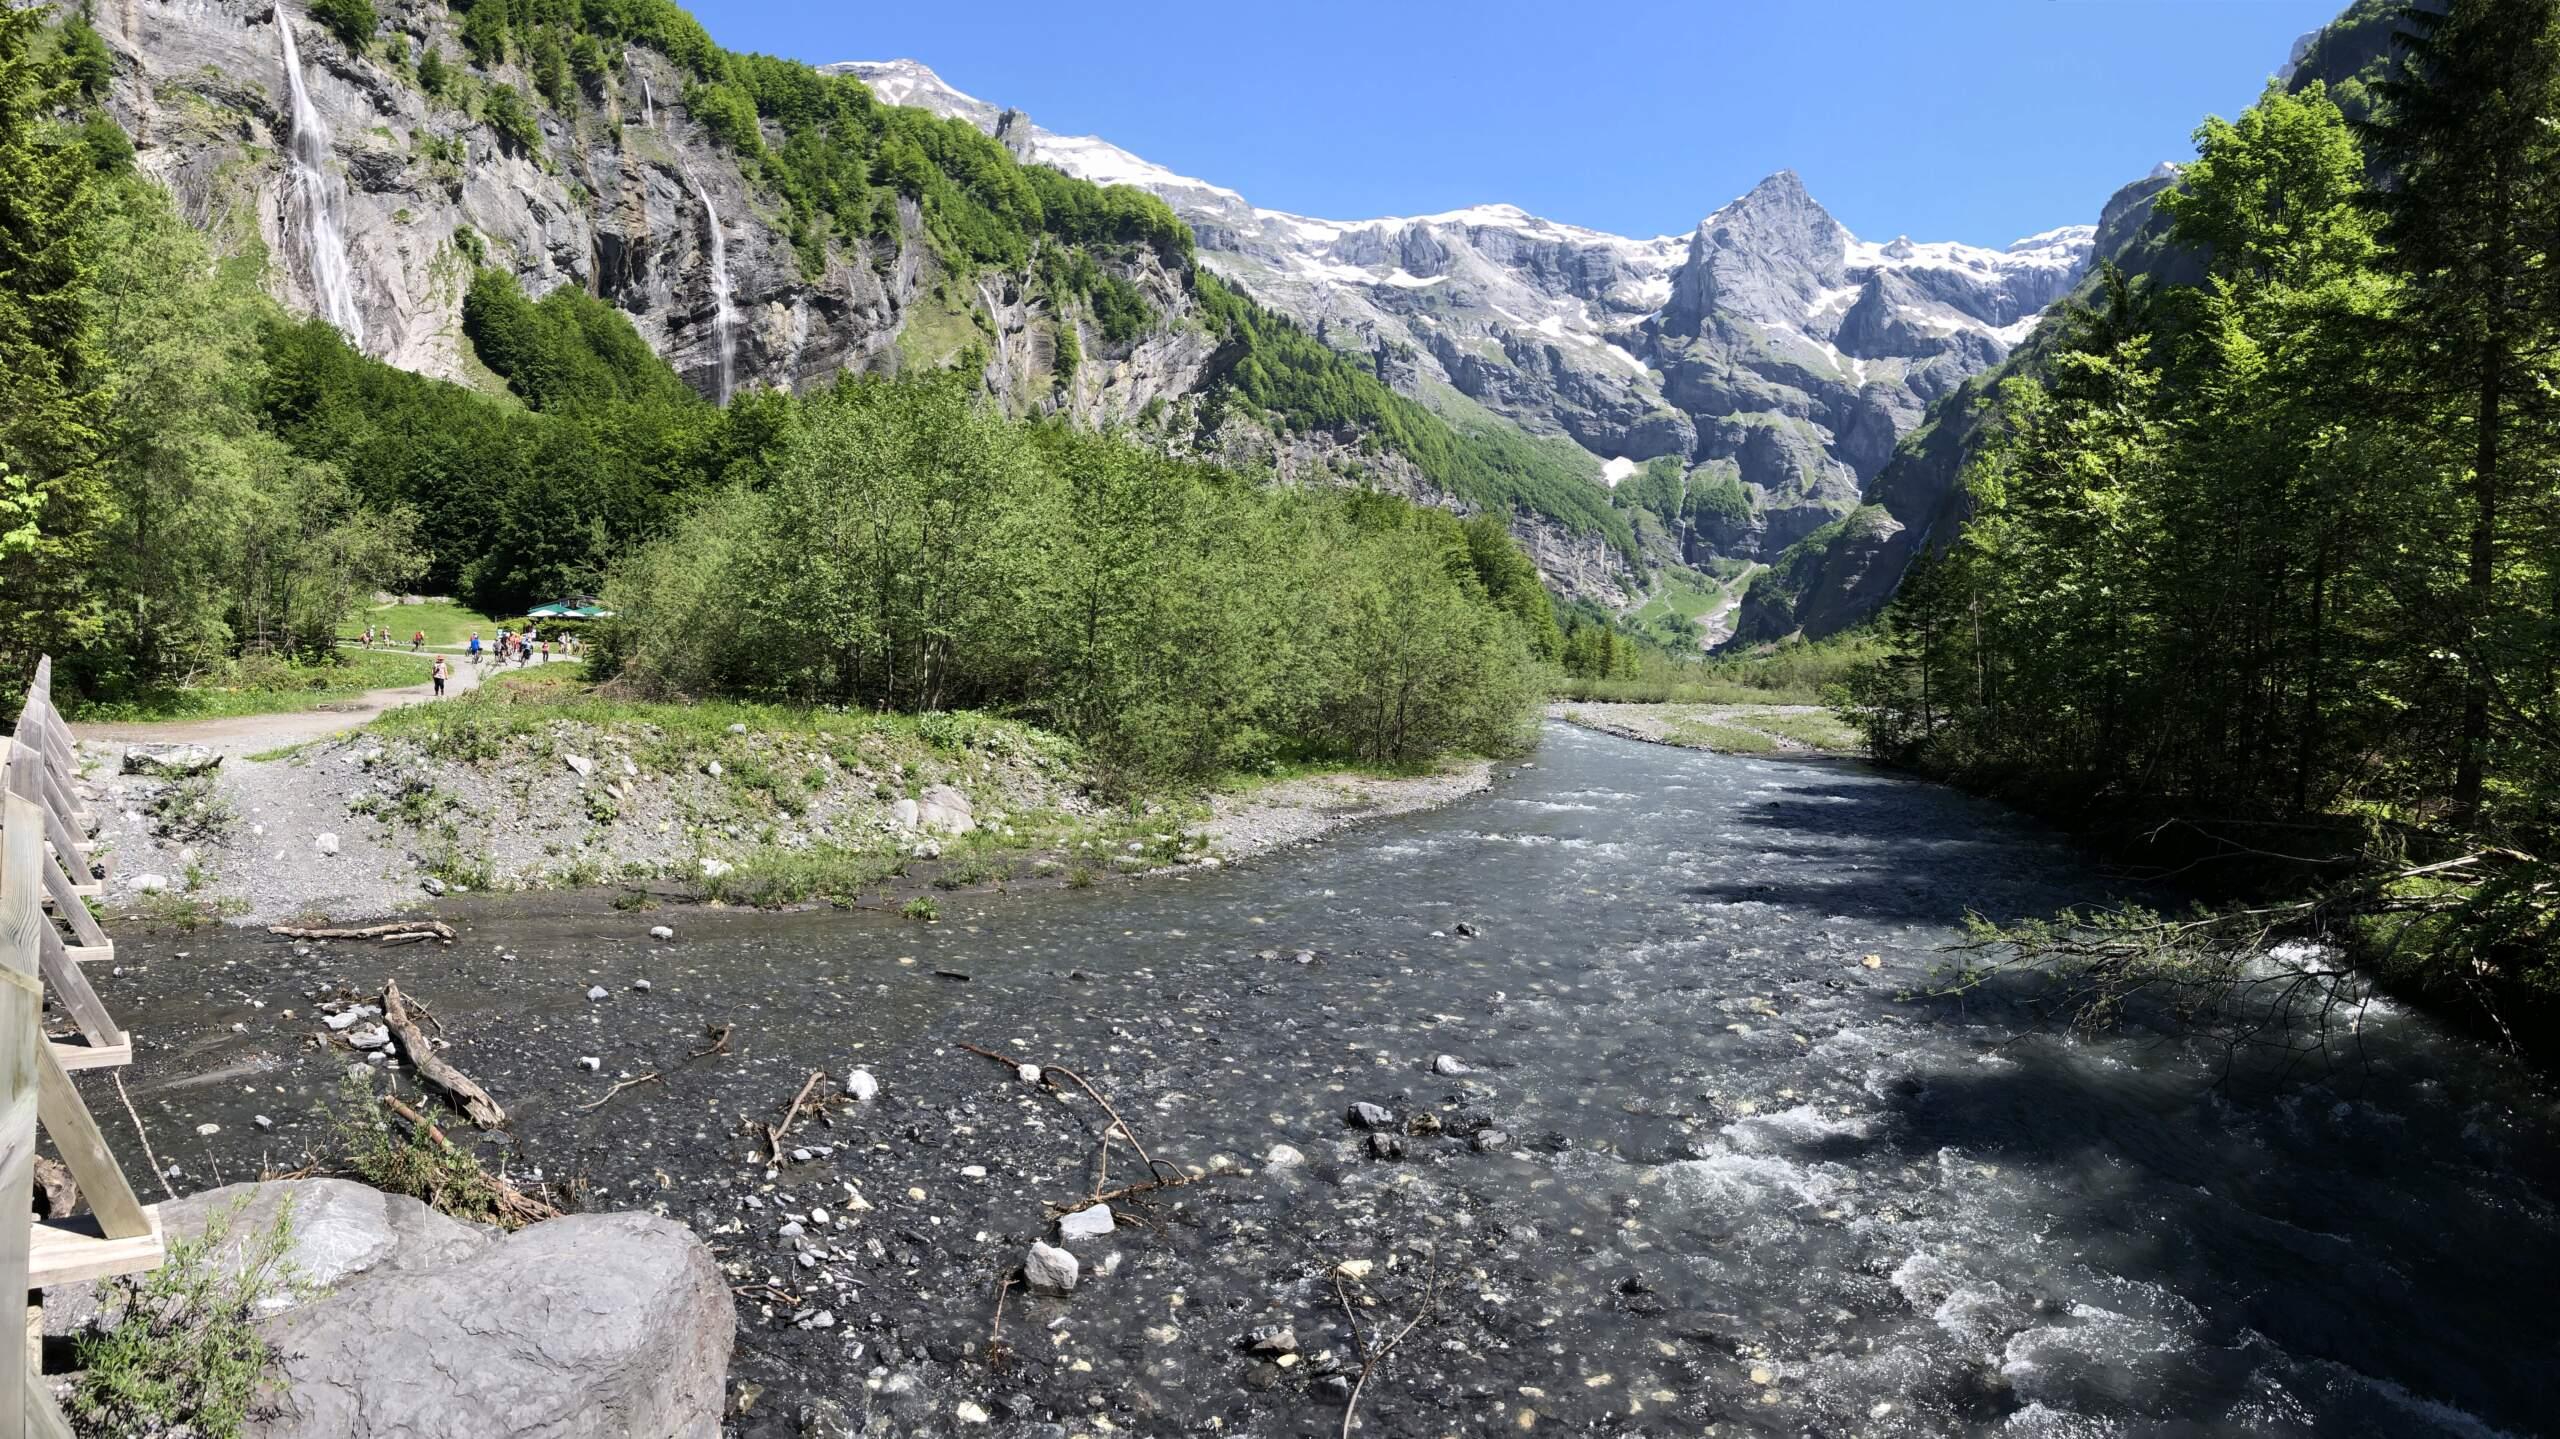 Petites balades en Rhône-Alpes - Page 3 Sixt_f15